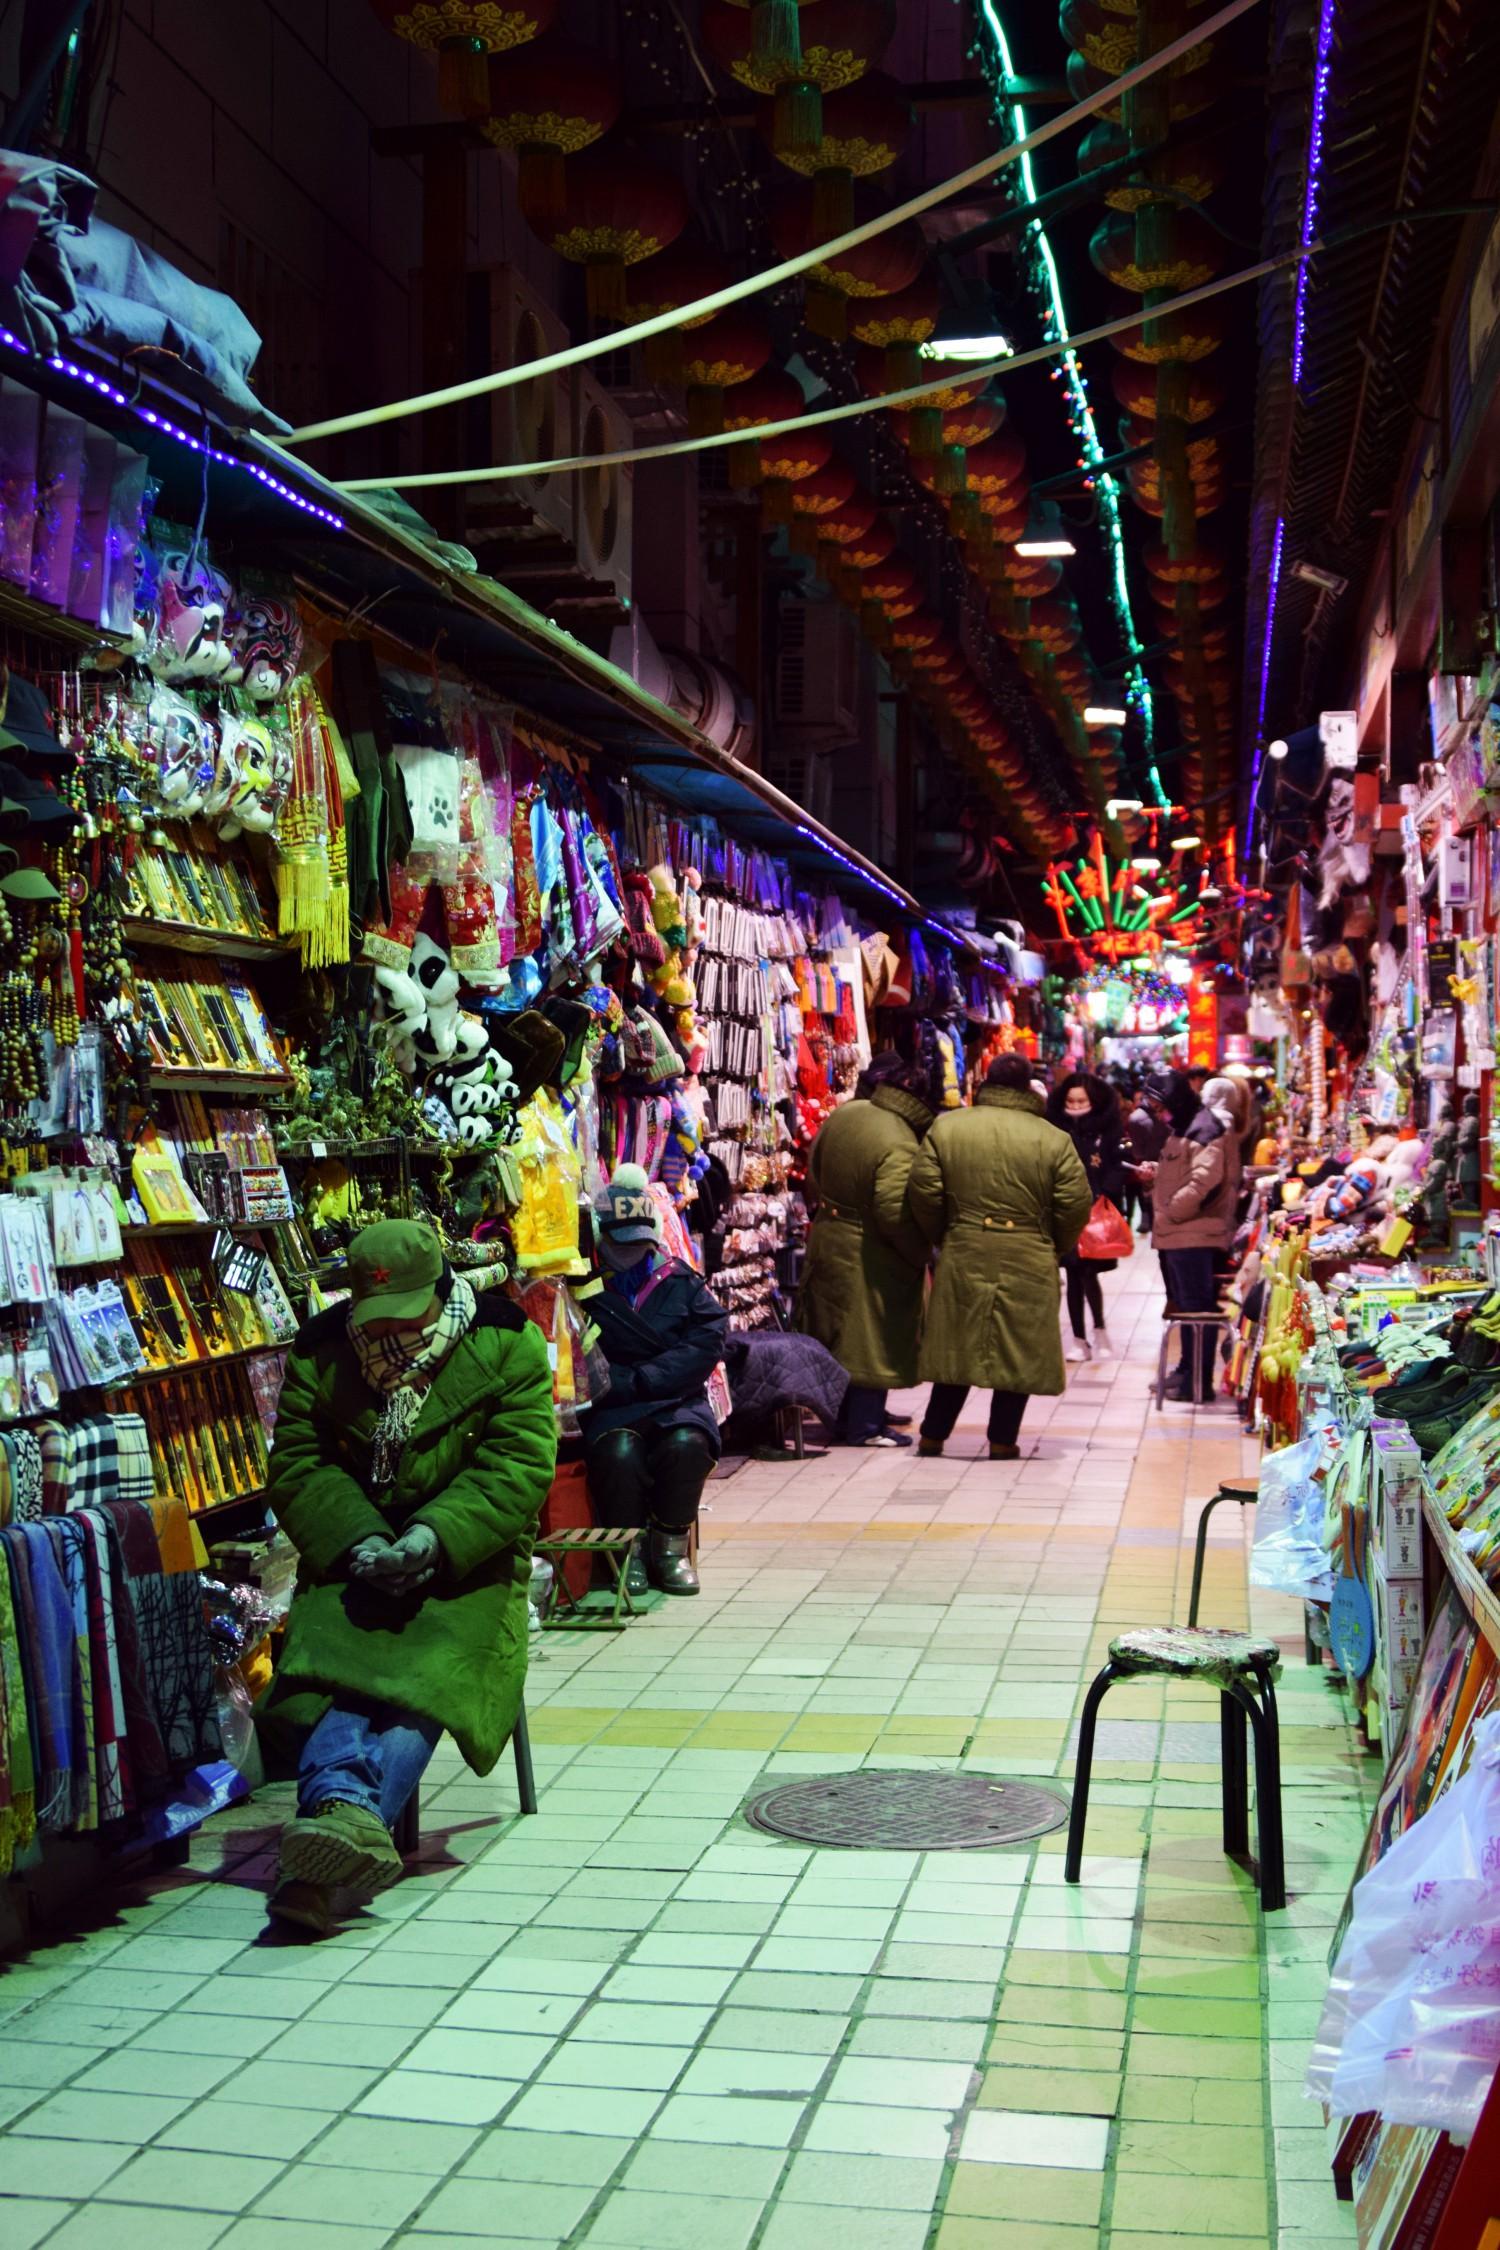 Reise nach Henan / China - Ankunft in Peking - Nachtmarkt